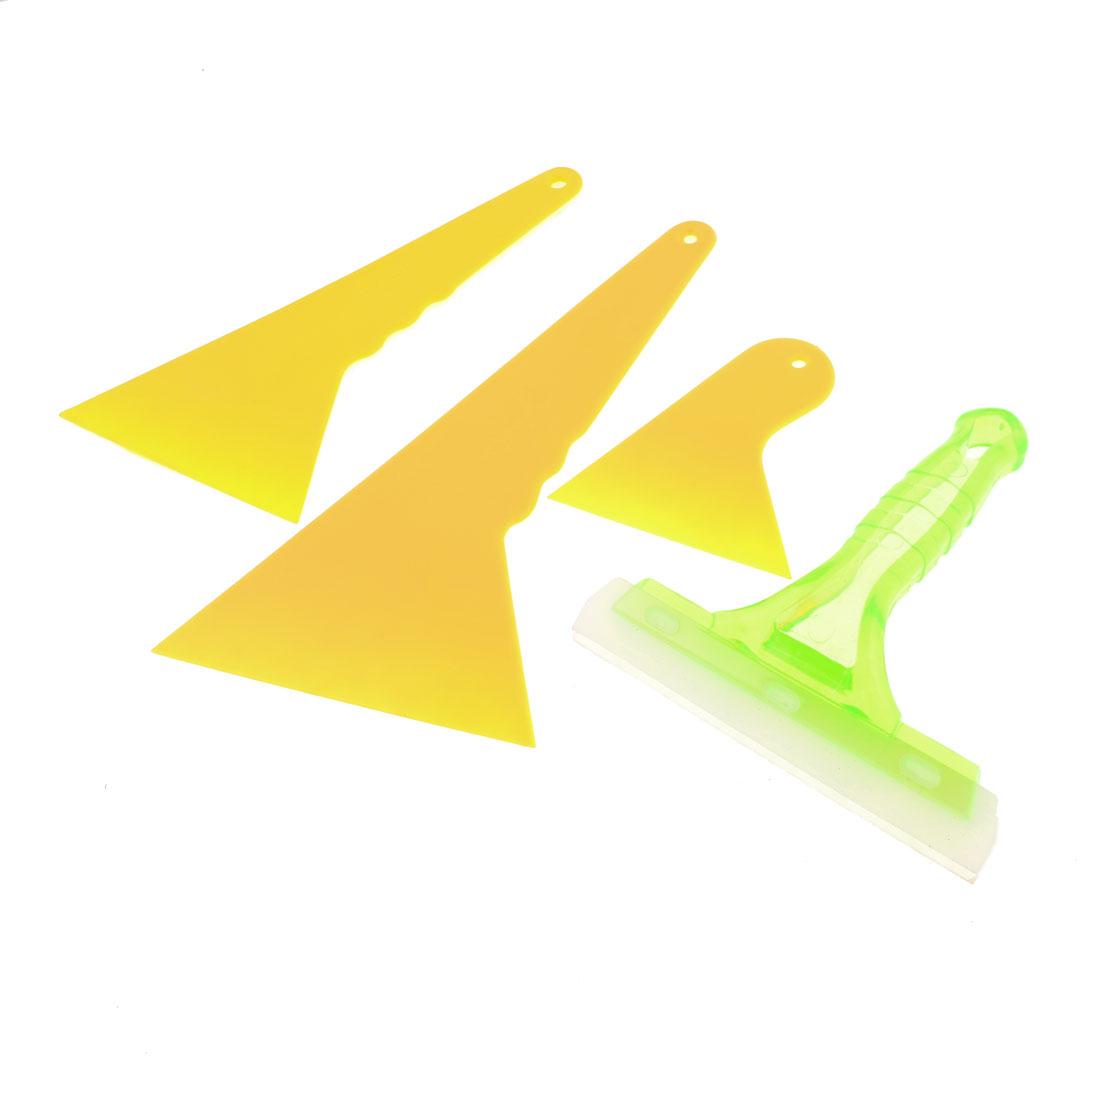 Auto Plastic Window Windshield Tint Film Scraper Cleaning Tool Yellow 4 in 1